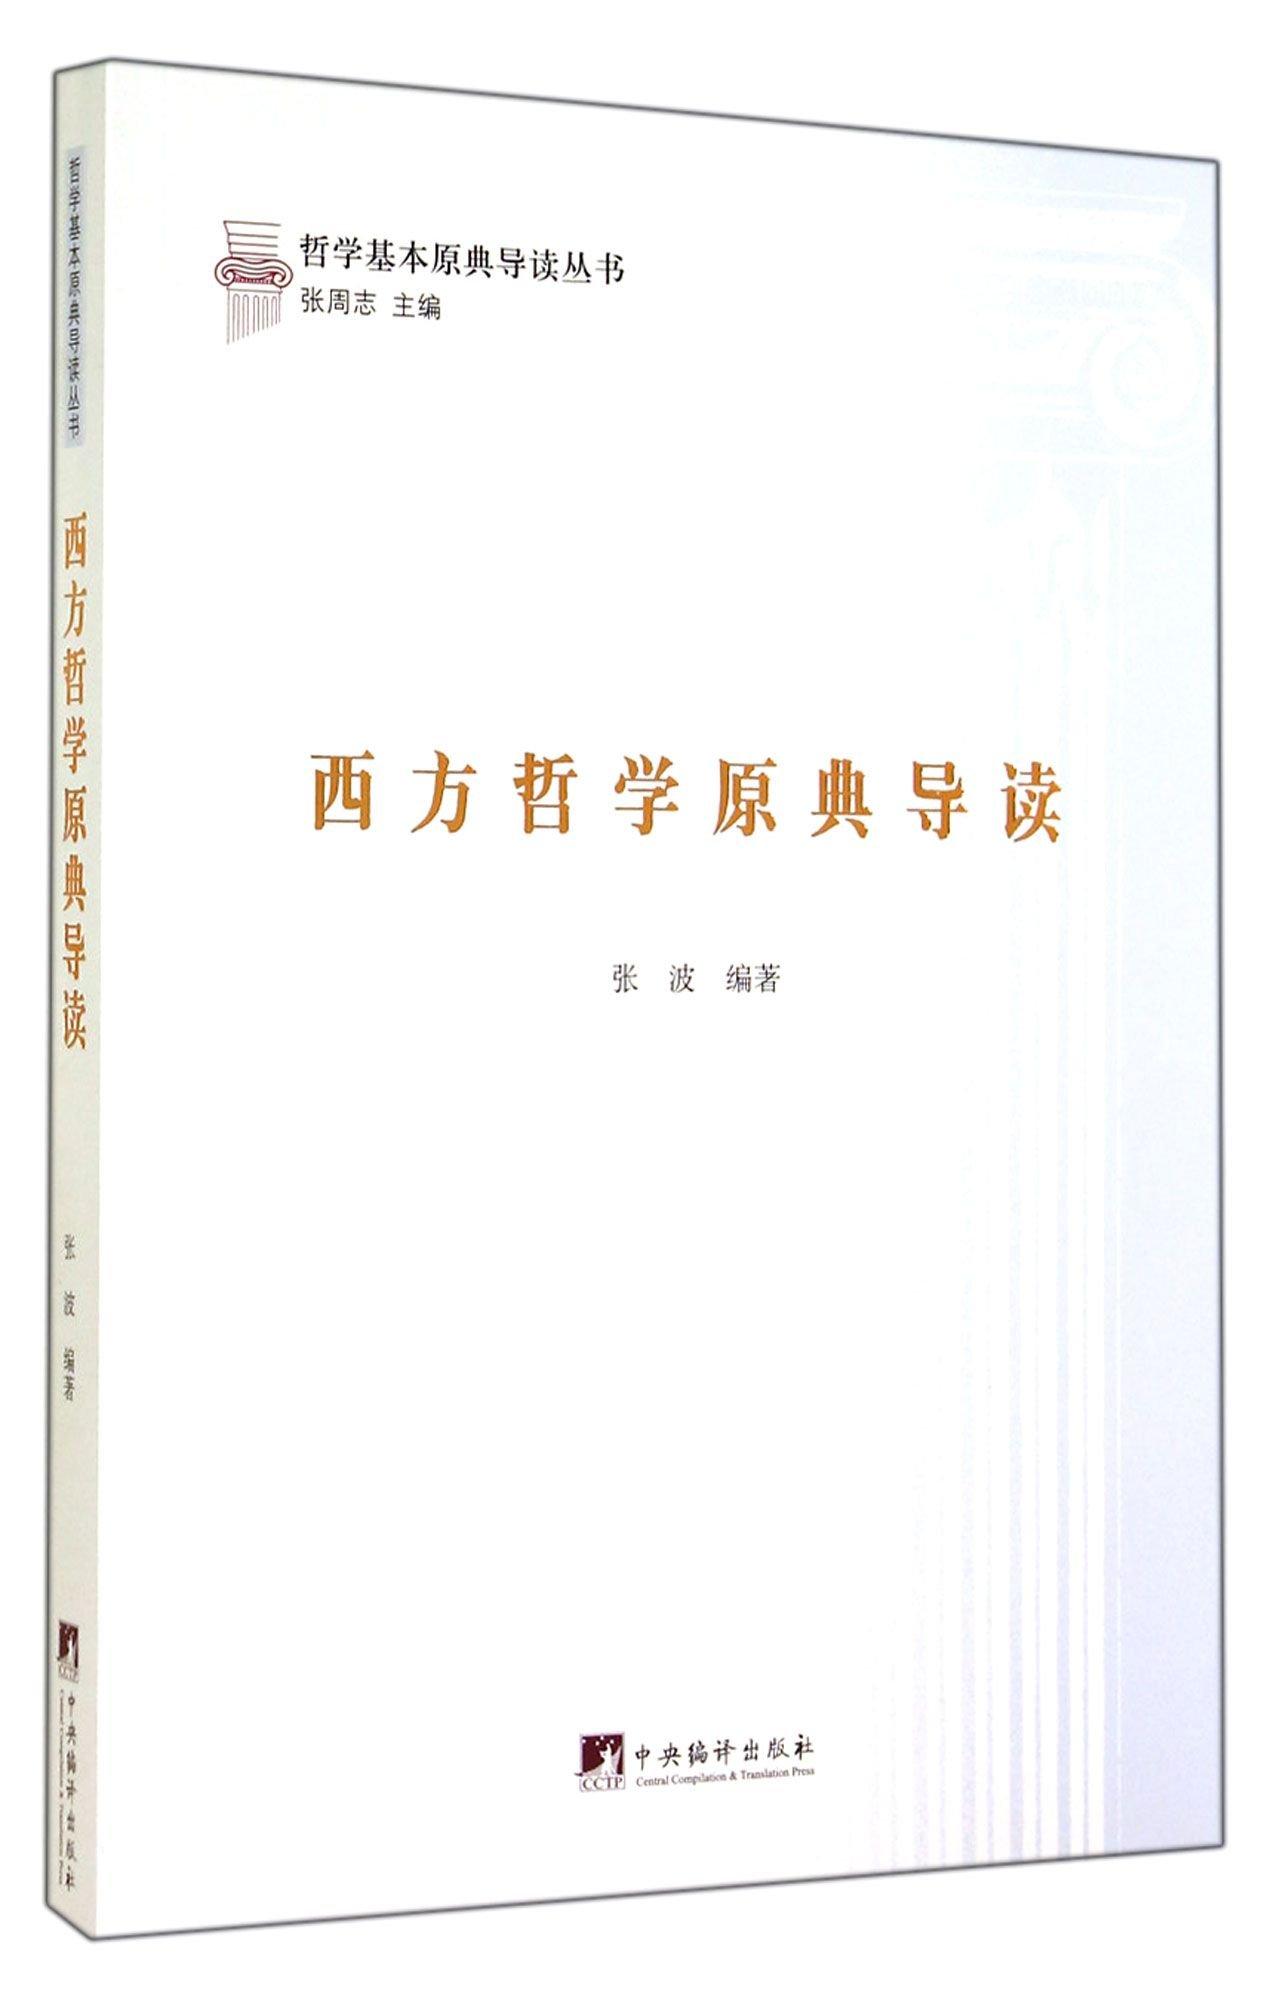 Read Online Classics of Western Philosophy Introduction (Introduction to Philosophy Basic Books Classics)(Chinese Edition) PDF ePub ebook